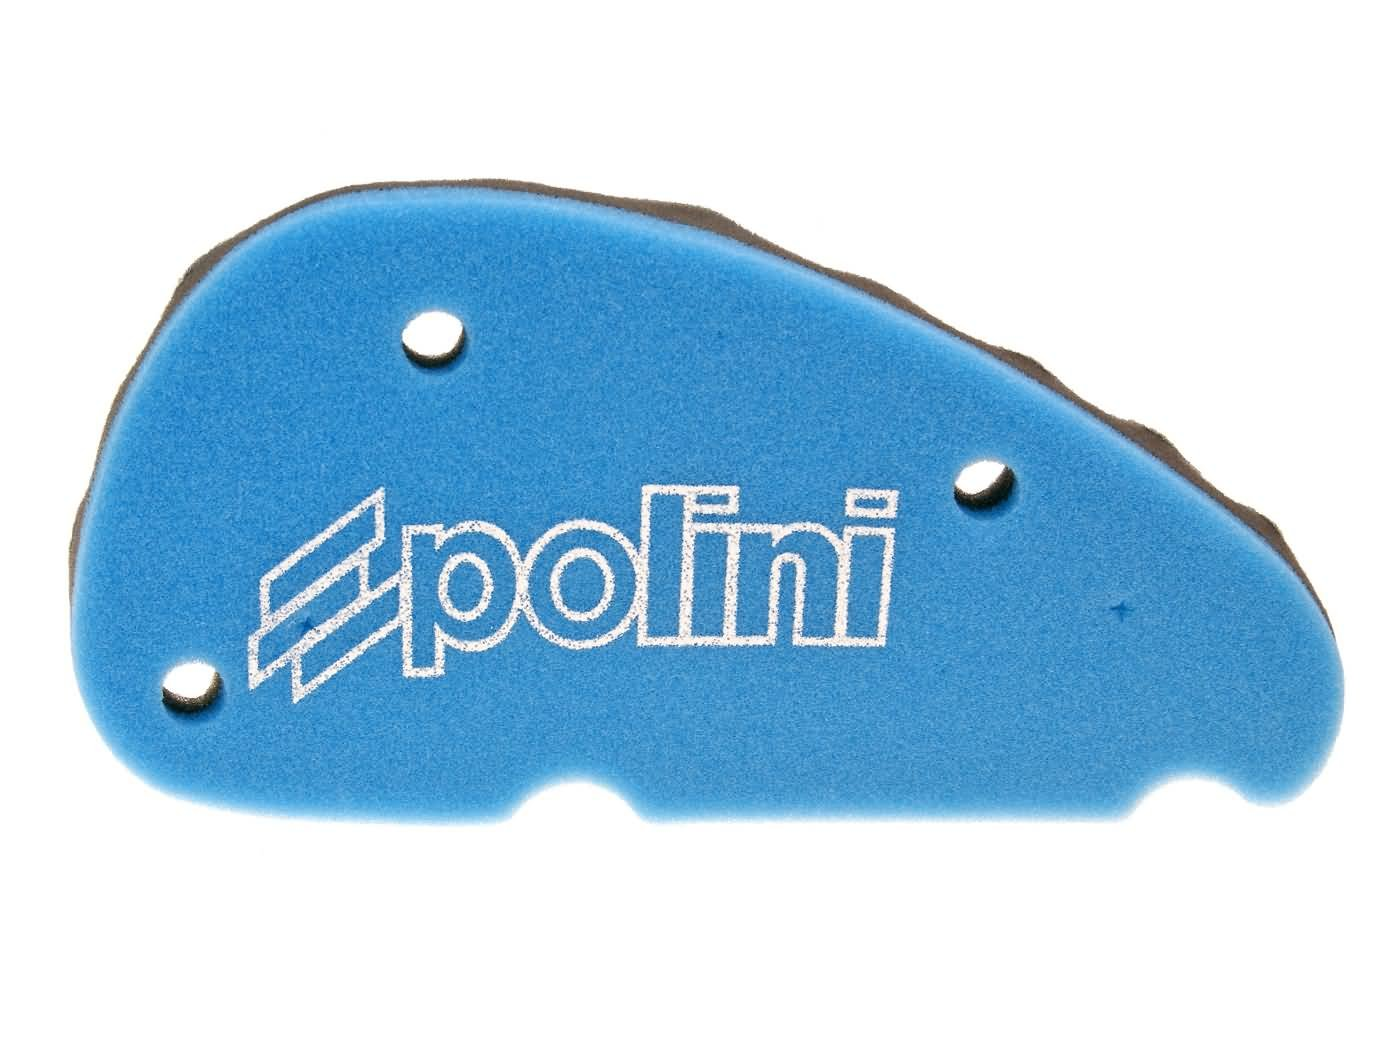 Piaggio Suzuki Katana Luftfilter Einsatz Polini f/ür Aprilia SR50 2T